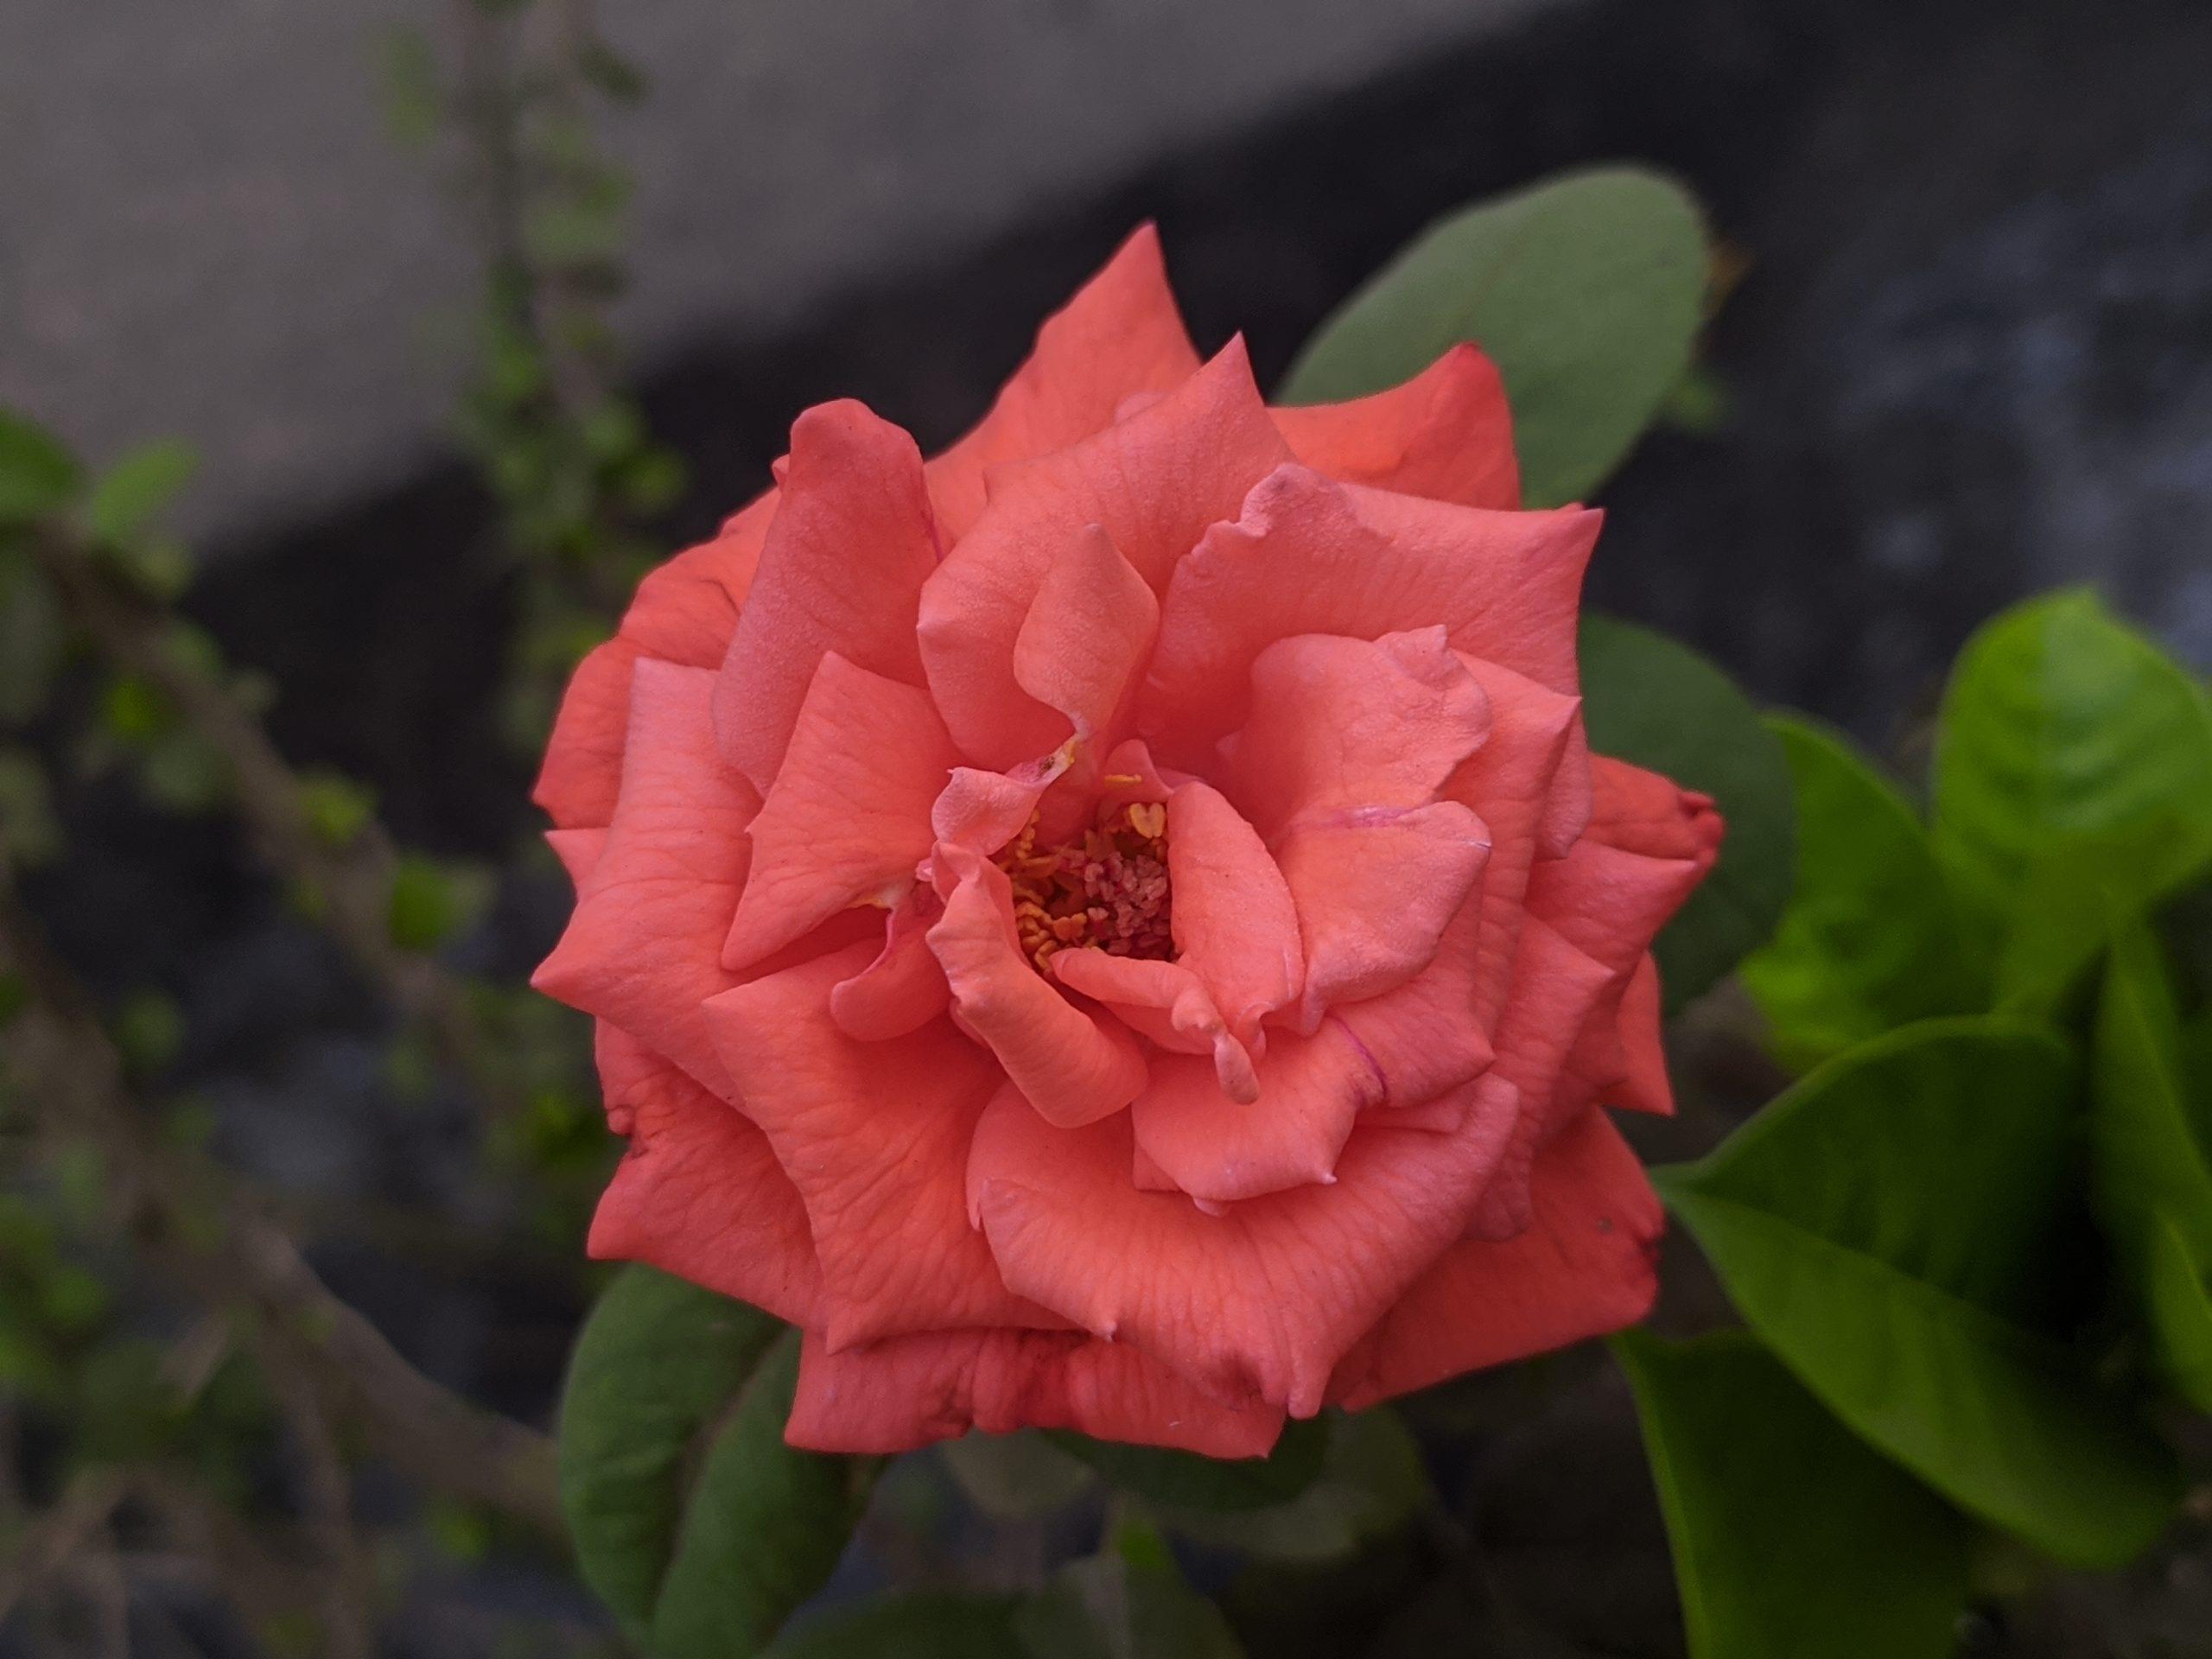 A fresh rose